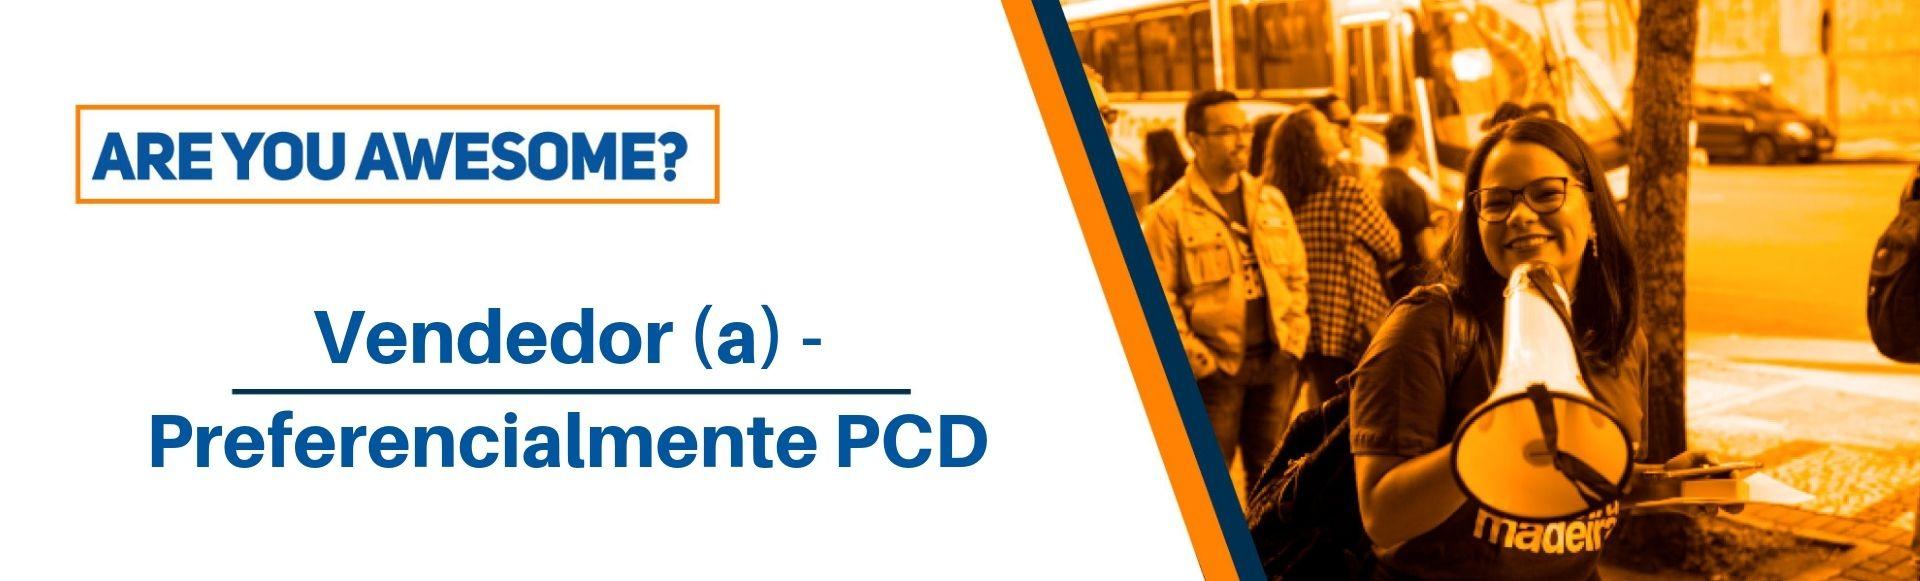 Vendedor (a) - Preferencialmente PCD